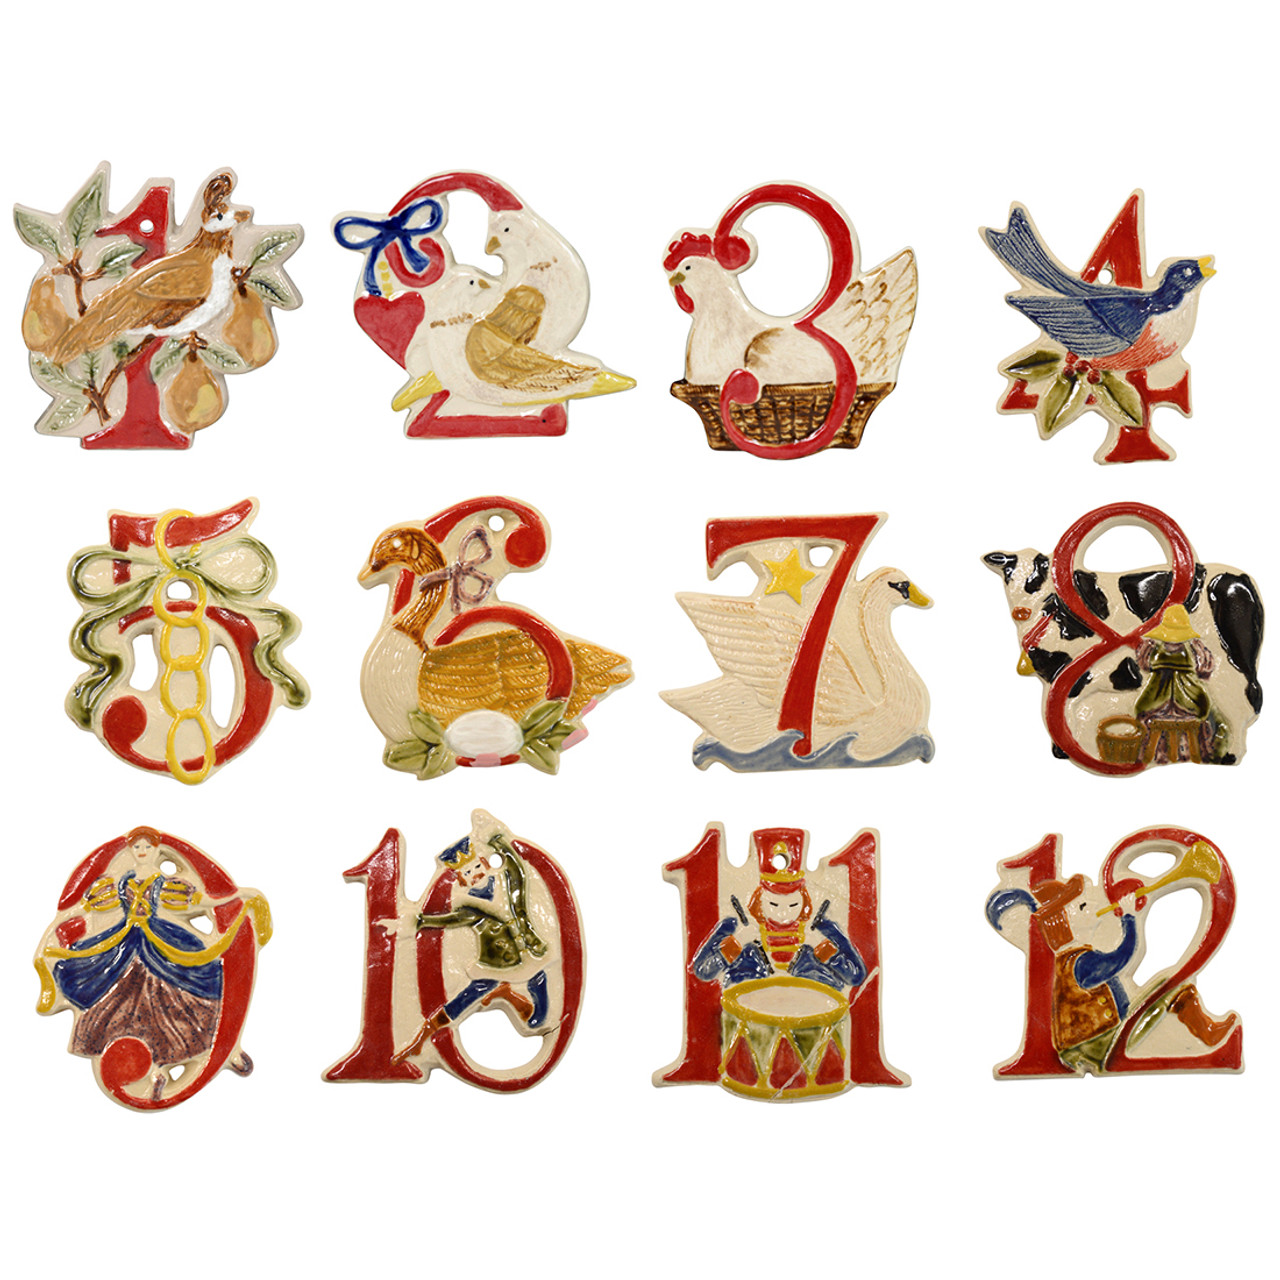 Twelve Days Of Christmas Ornaments.The Twelve Days Of Christmas Ornament Set 1 12